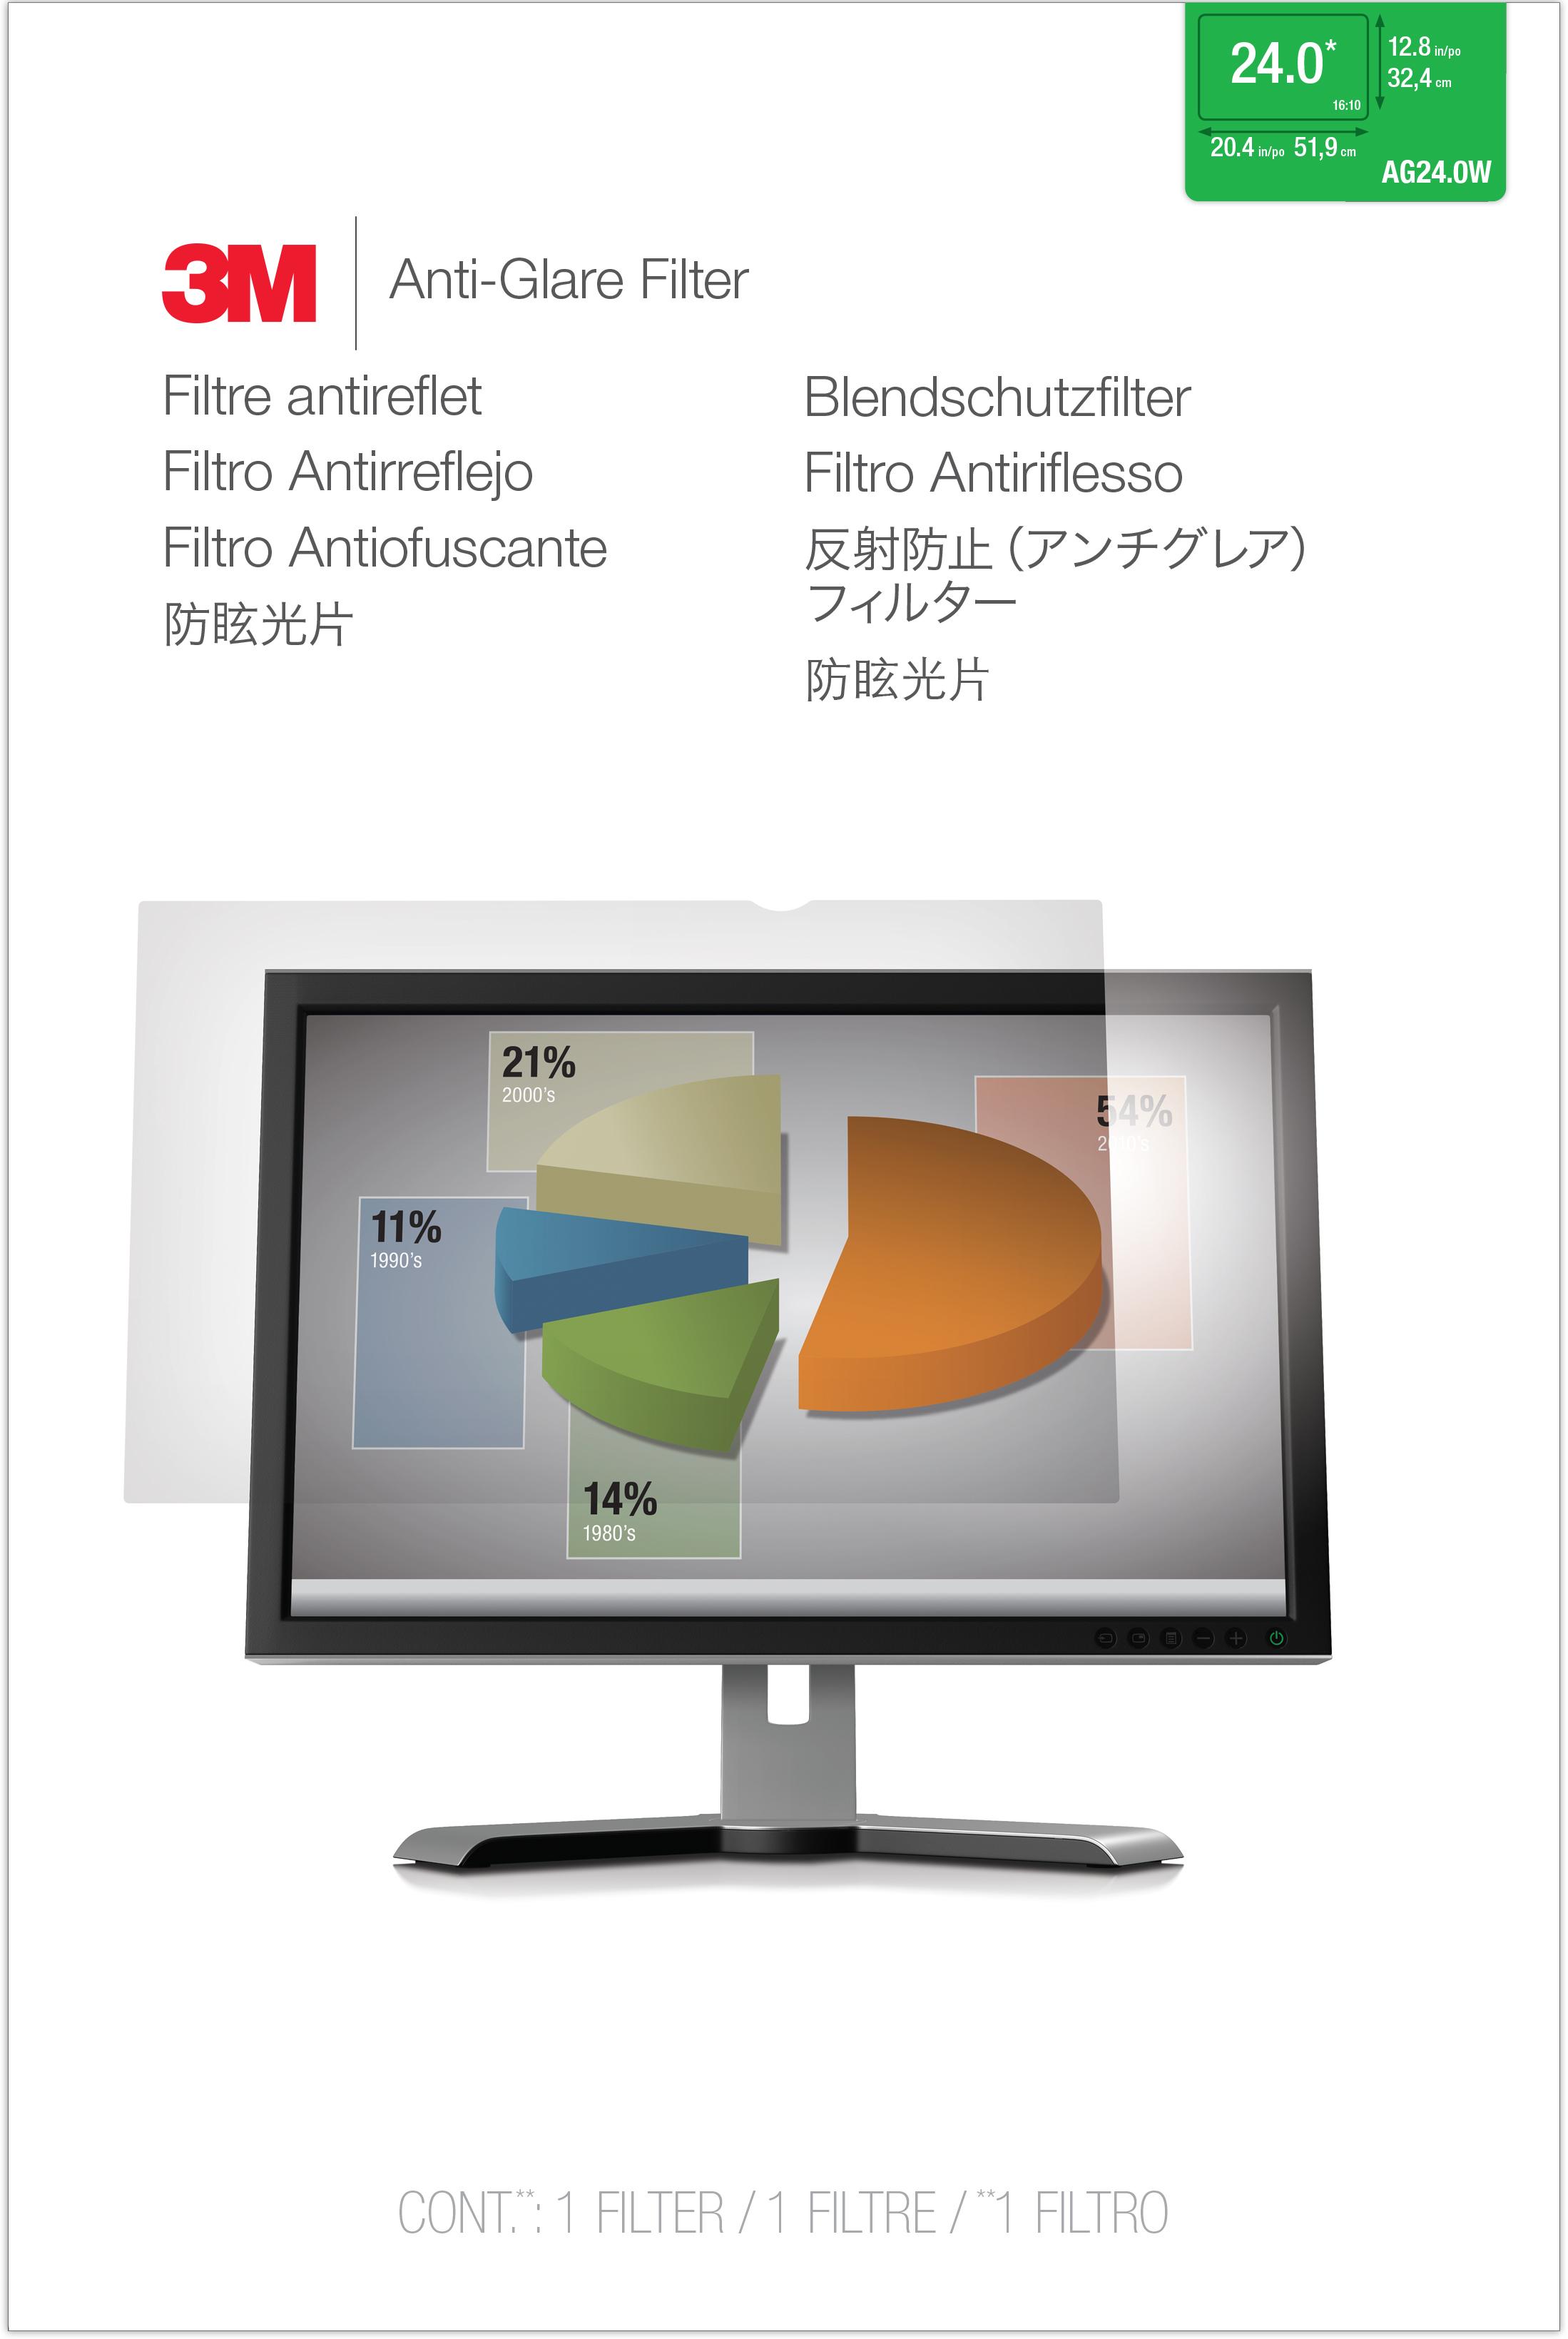 3M AG 24.0W Anti-Glare Filter